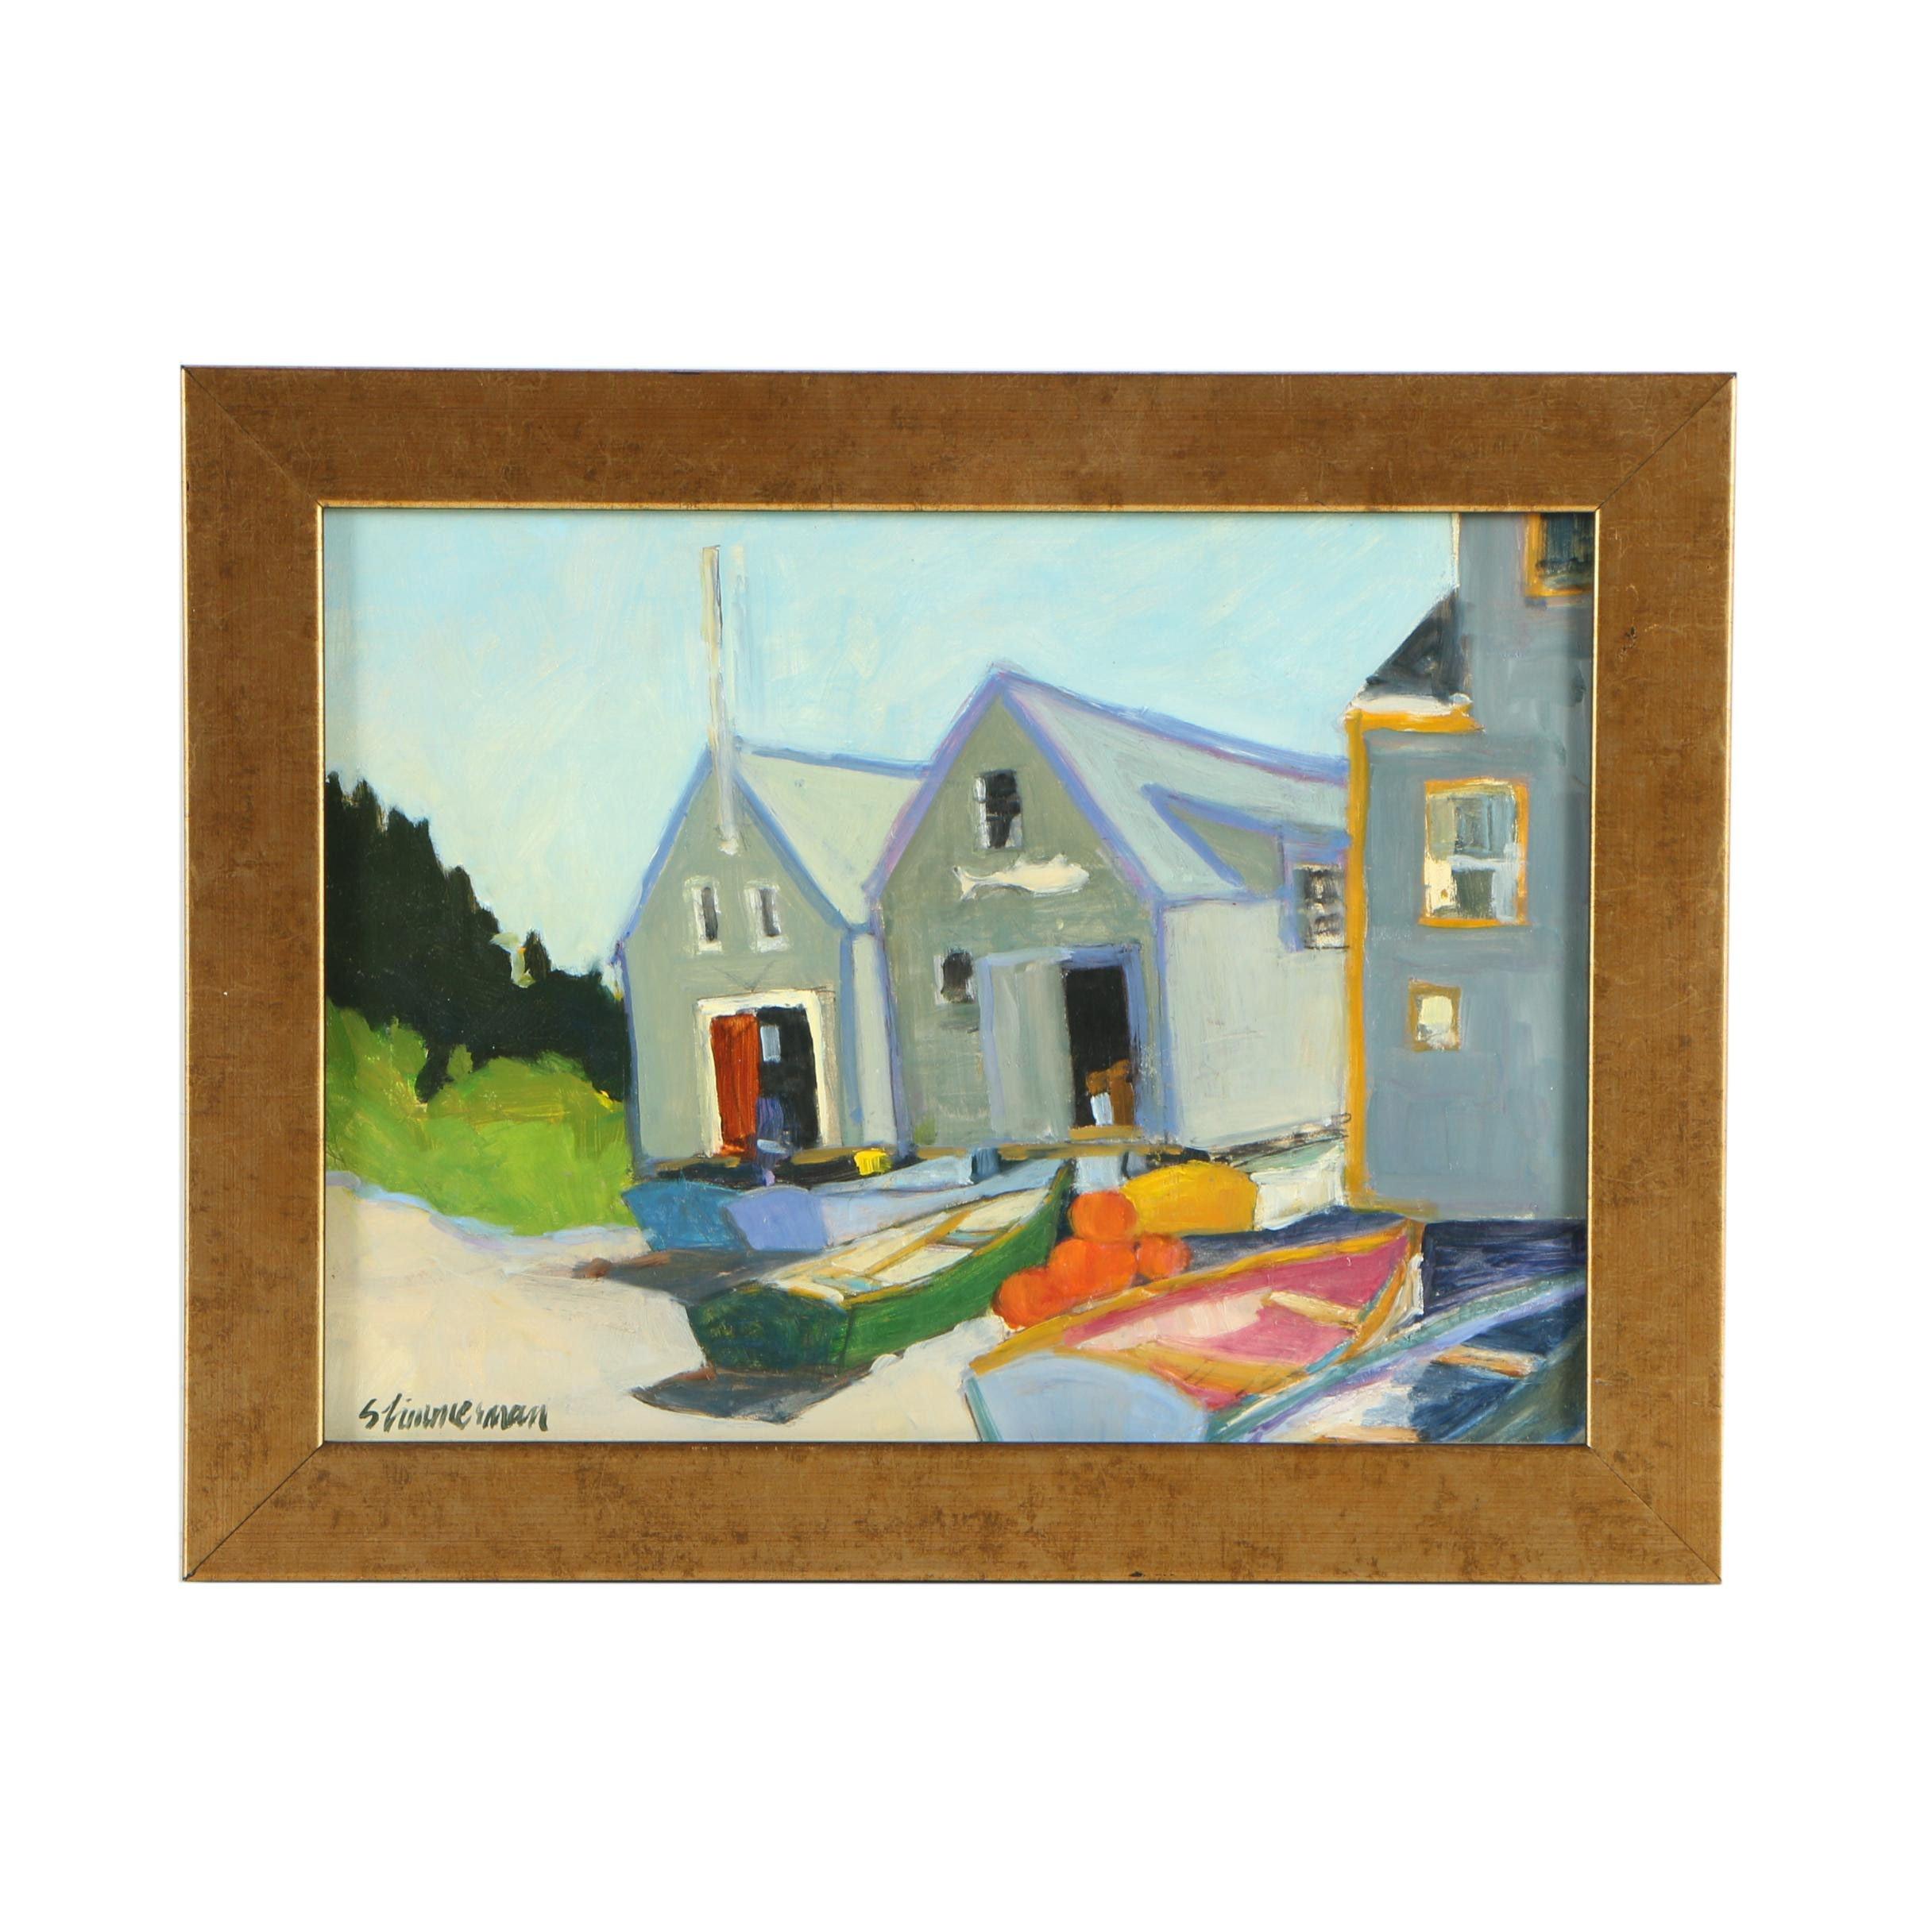 S. Zimmerman Oil Painting of Coastal Boathouses